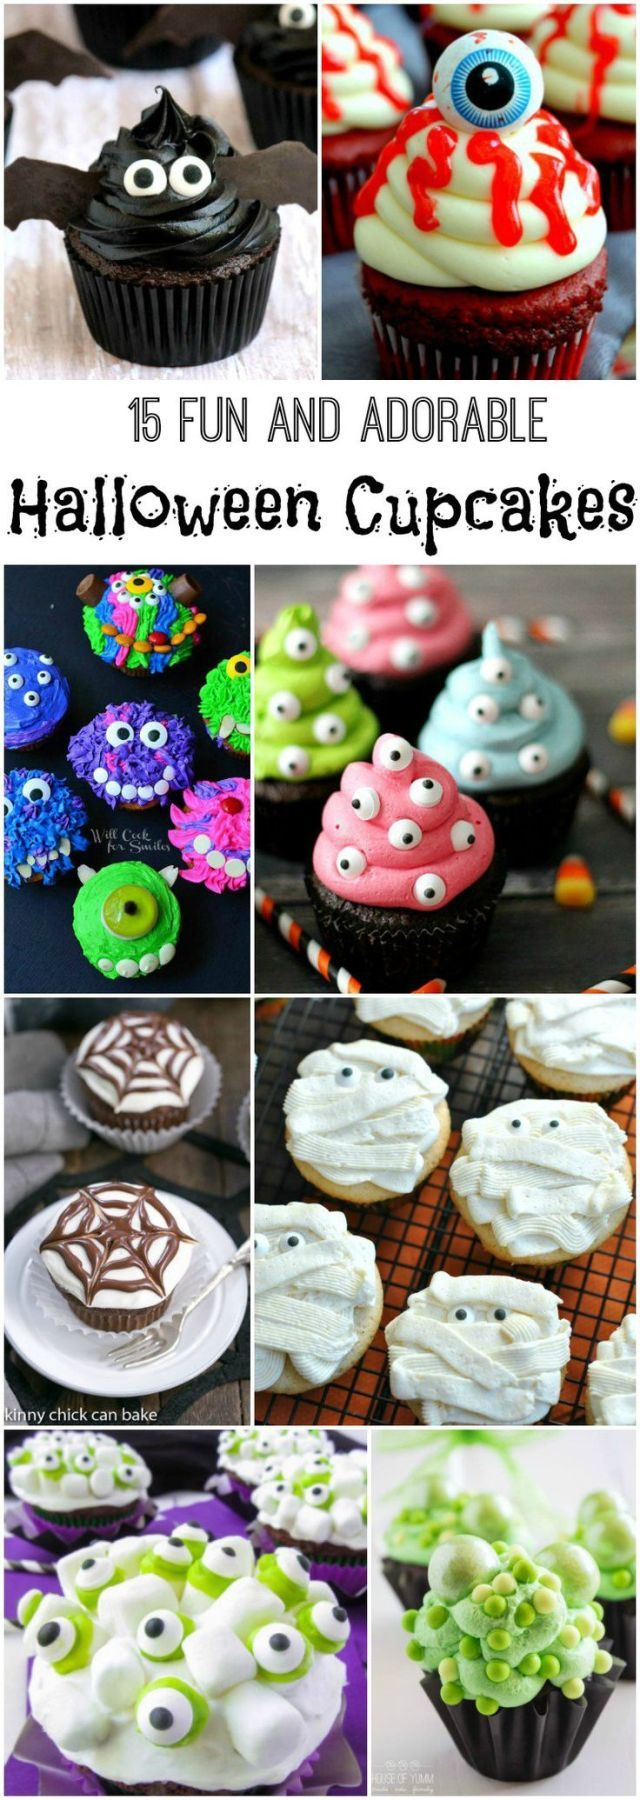 15 fun and adorable Halloween cupcakes #repashalloween